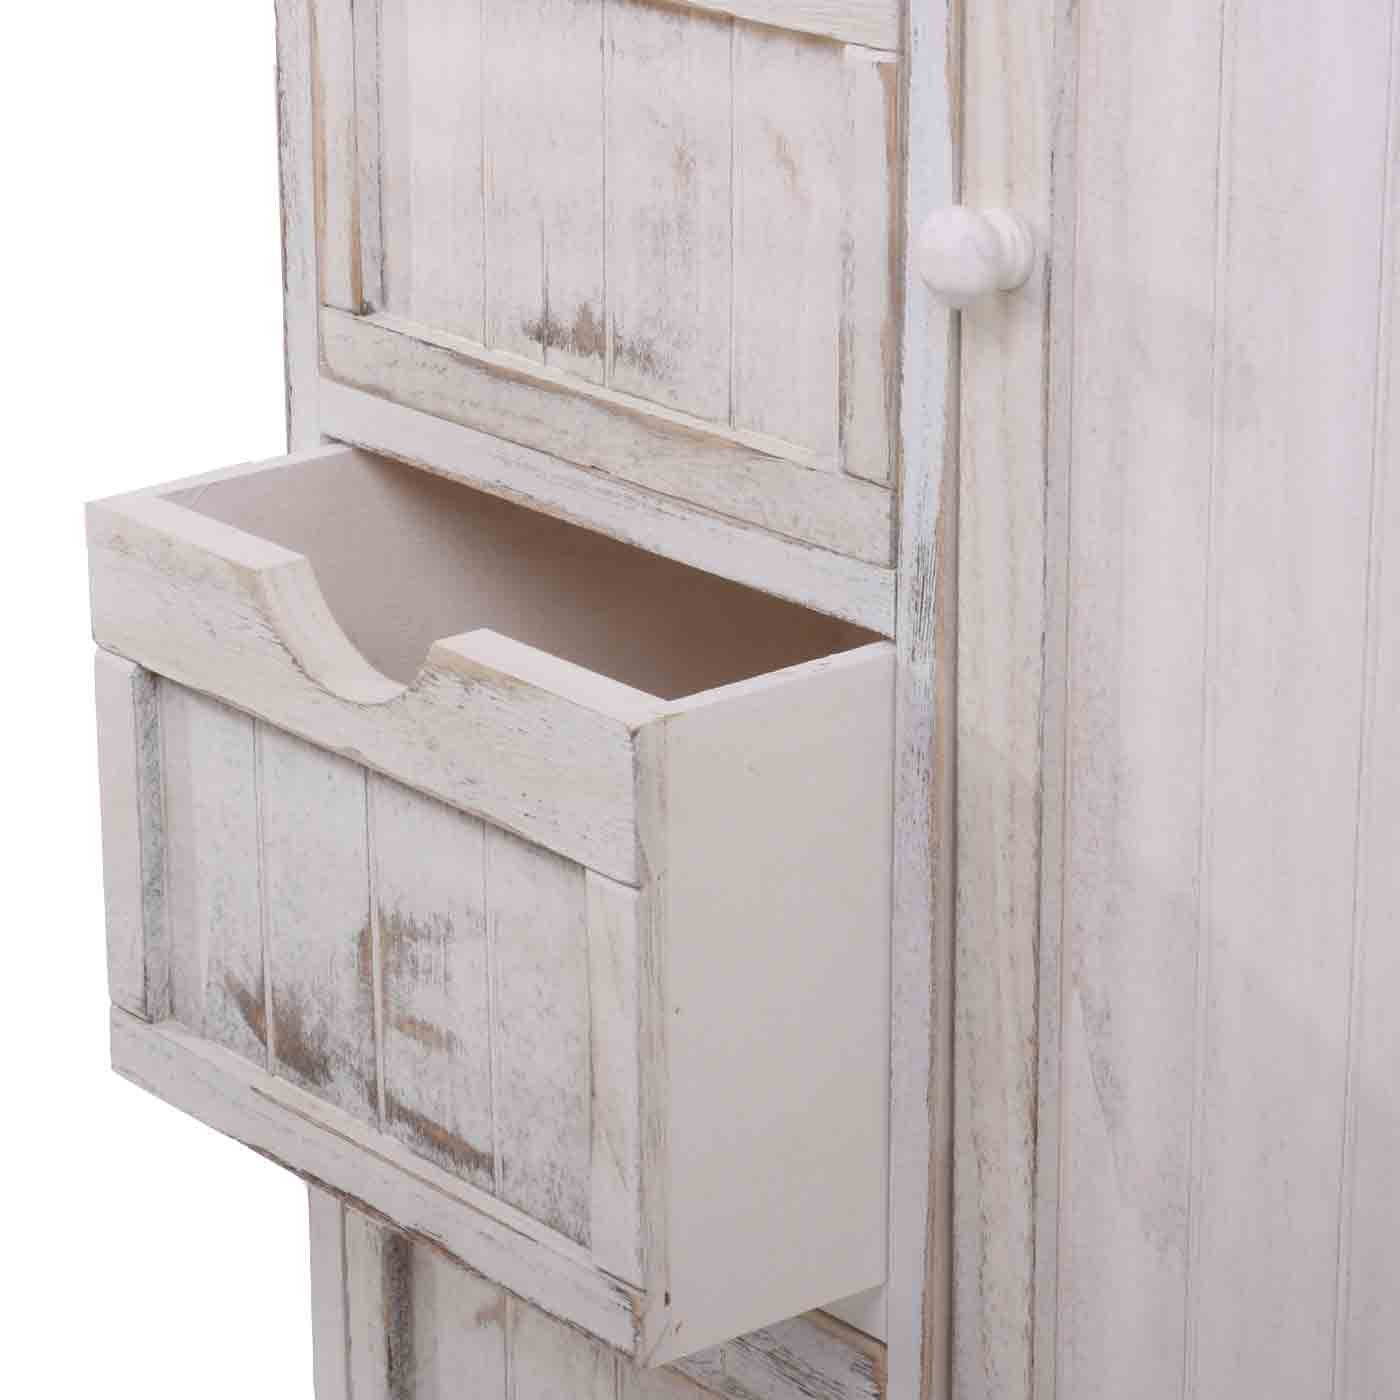 Shabby Look mendler kommode schrank 82x55x30cm shabby look vintage weiß